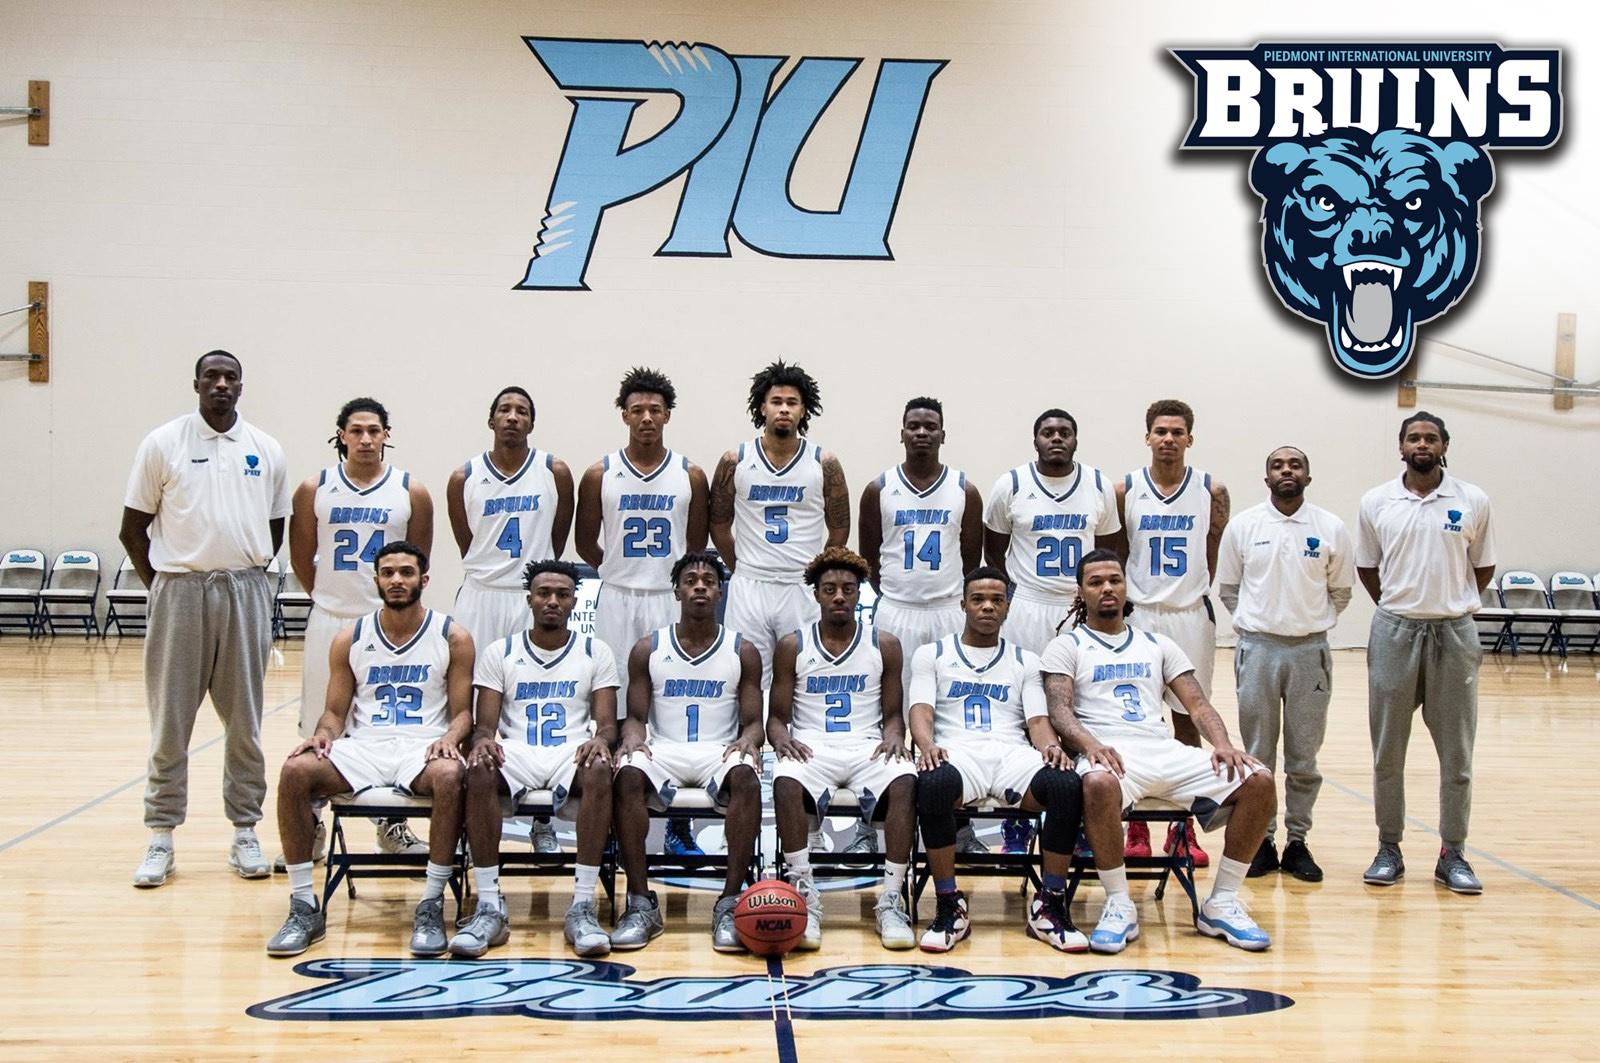 PIU-Mens-Basketball-Team.jpg